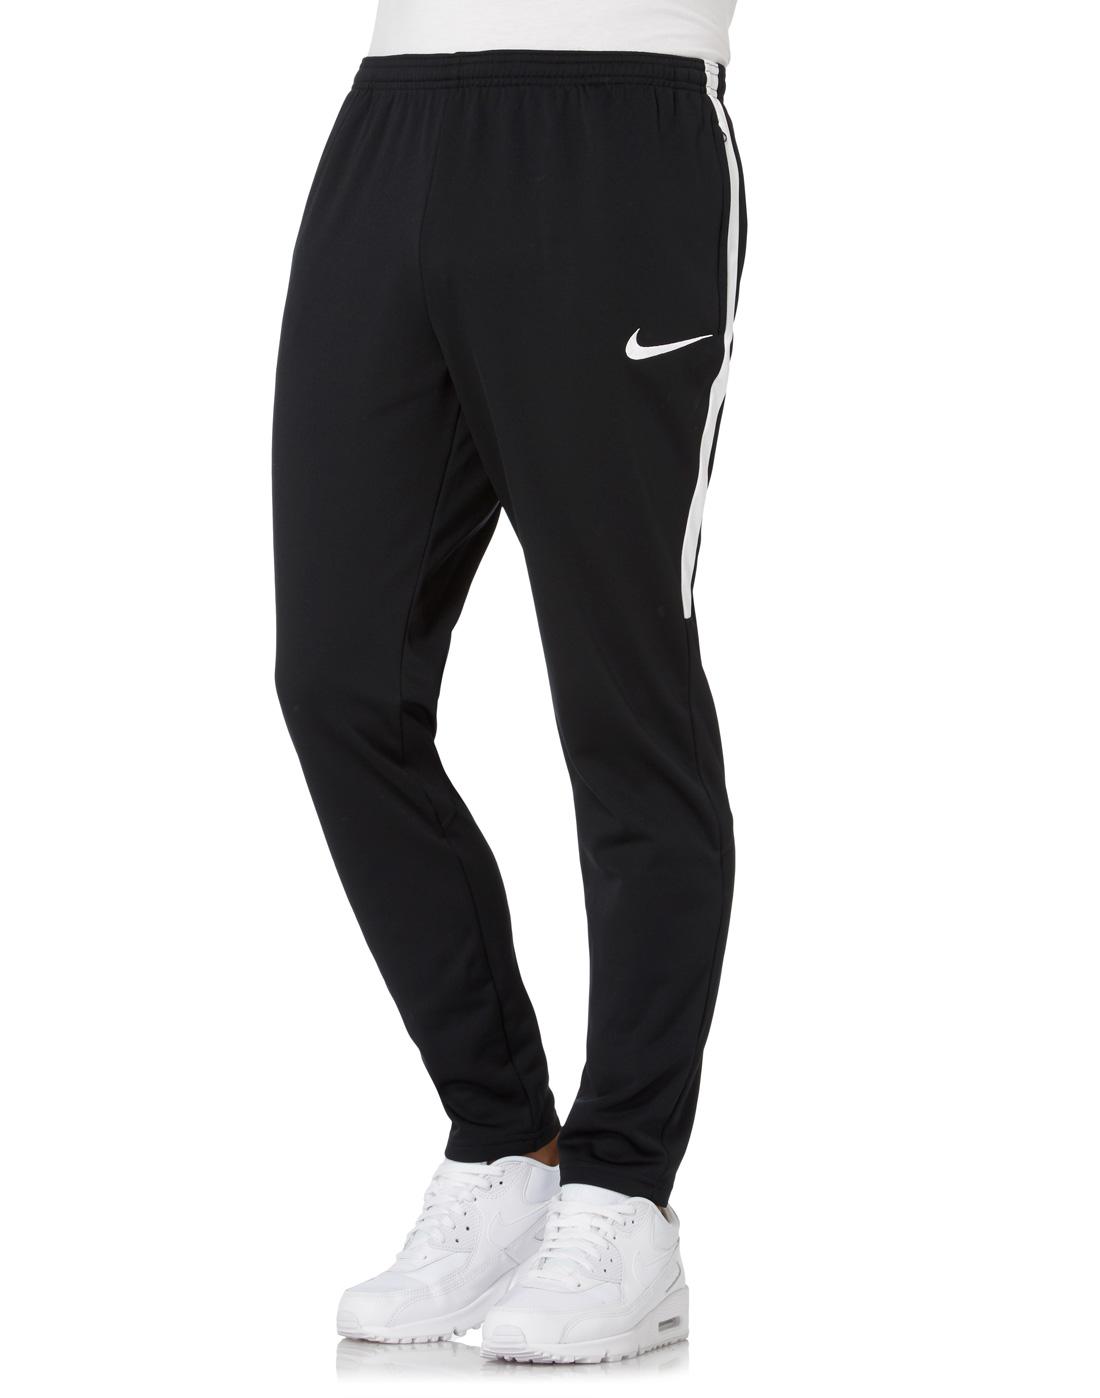 a053066e56 Nike Mens Academy Pant | Life Style Sports